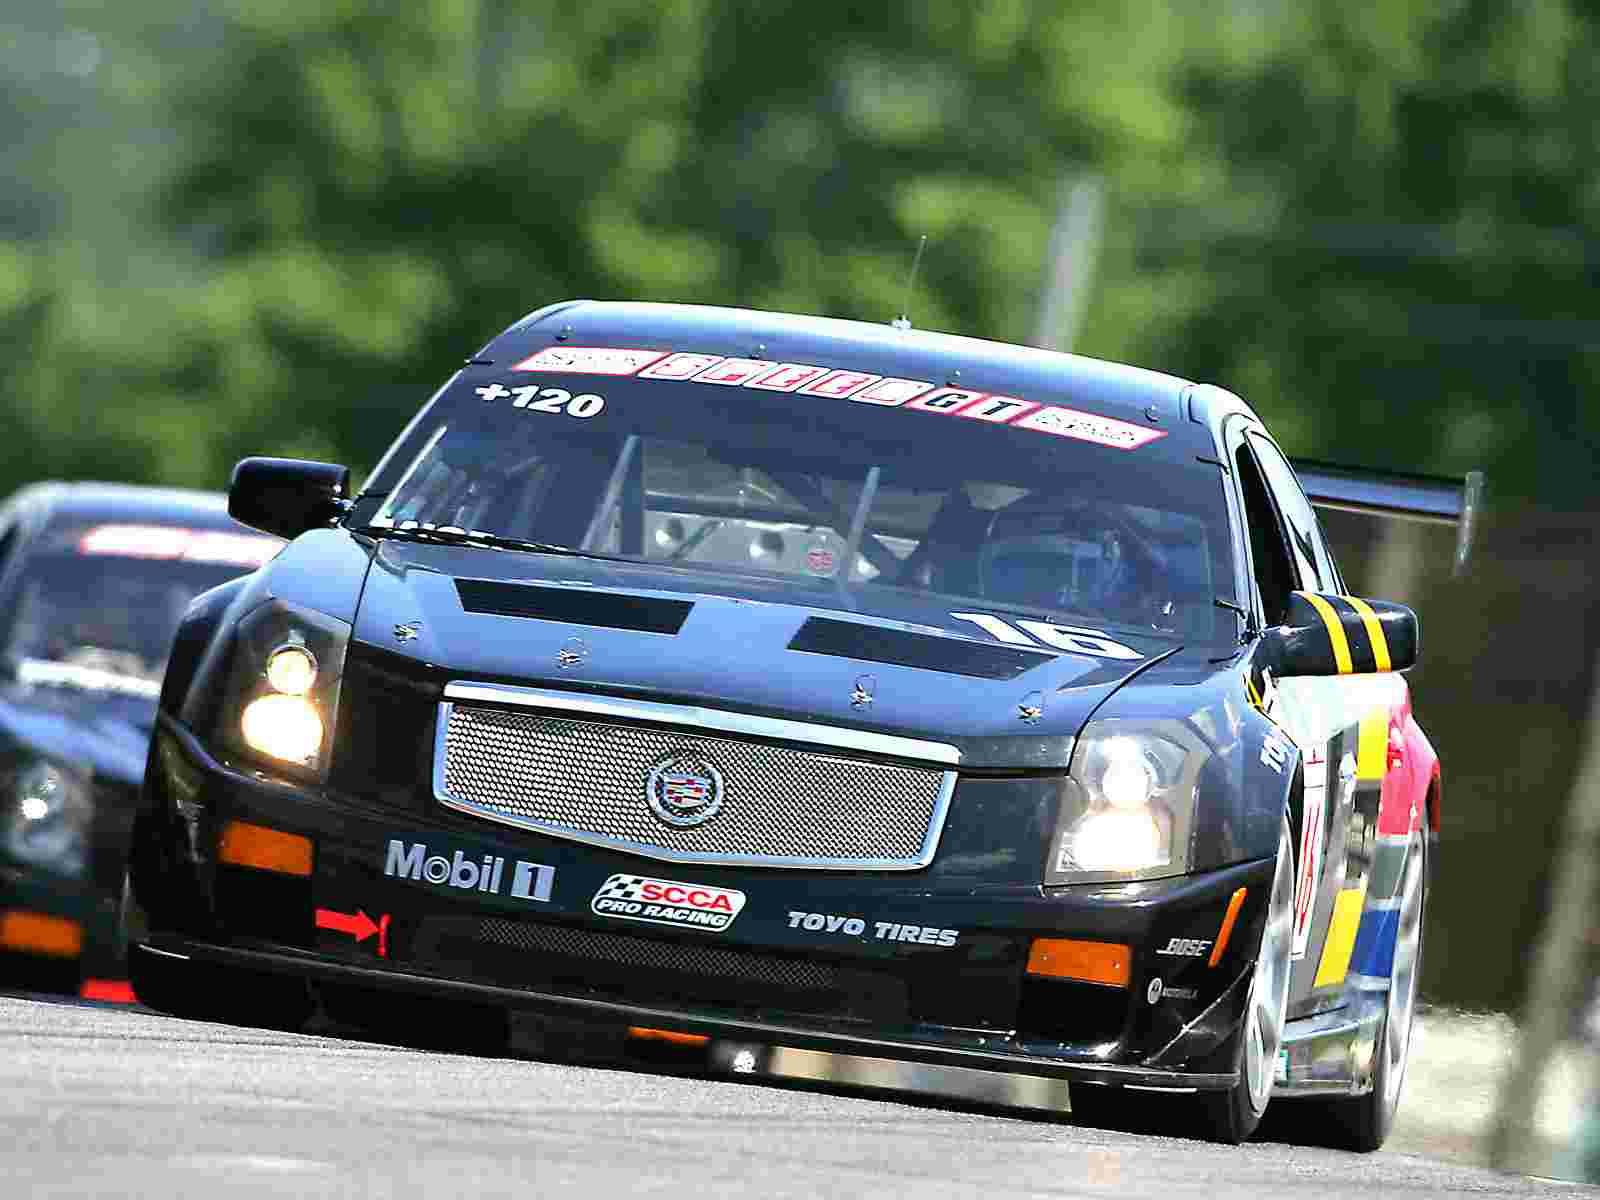 cadillac cts v race car 28613354 wallpaper   Cadillac   Auto Moto 1600x1200